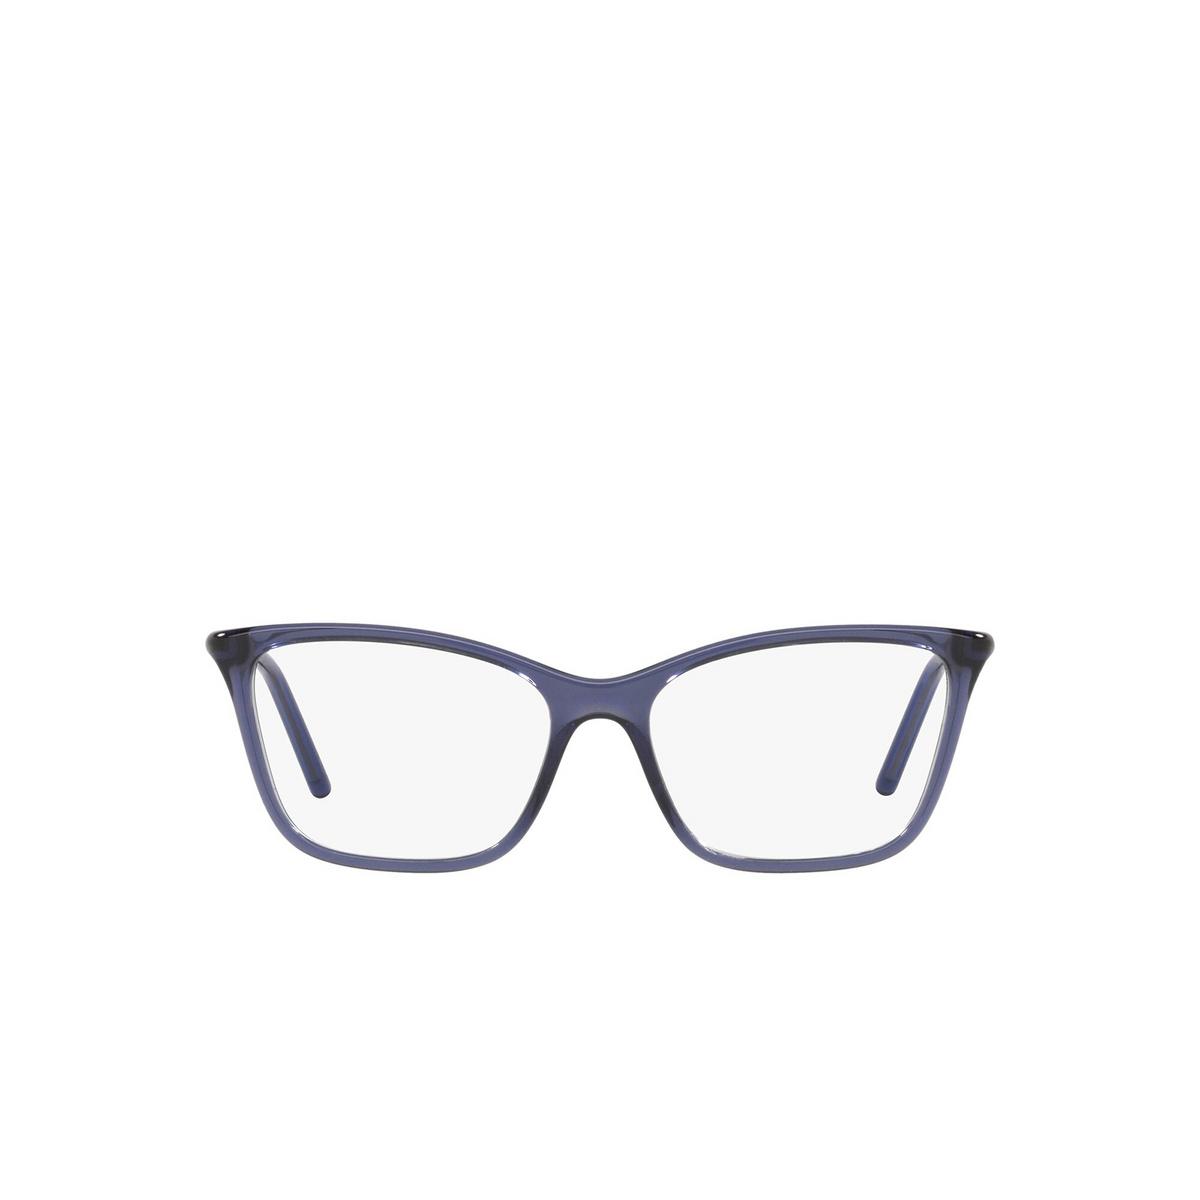 Prada® Cat-eye Eyeglasses: PR 08WV color Bluette 06M1O1 - front view.